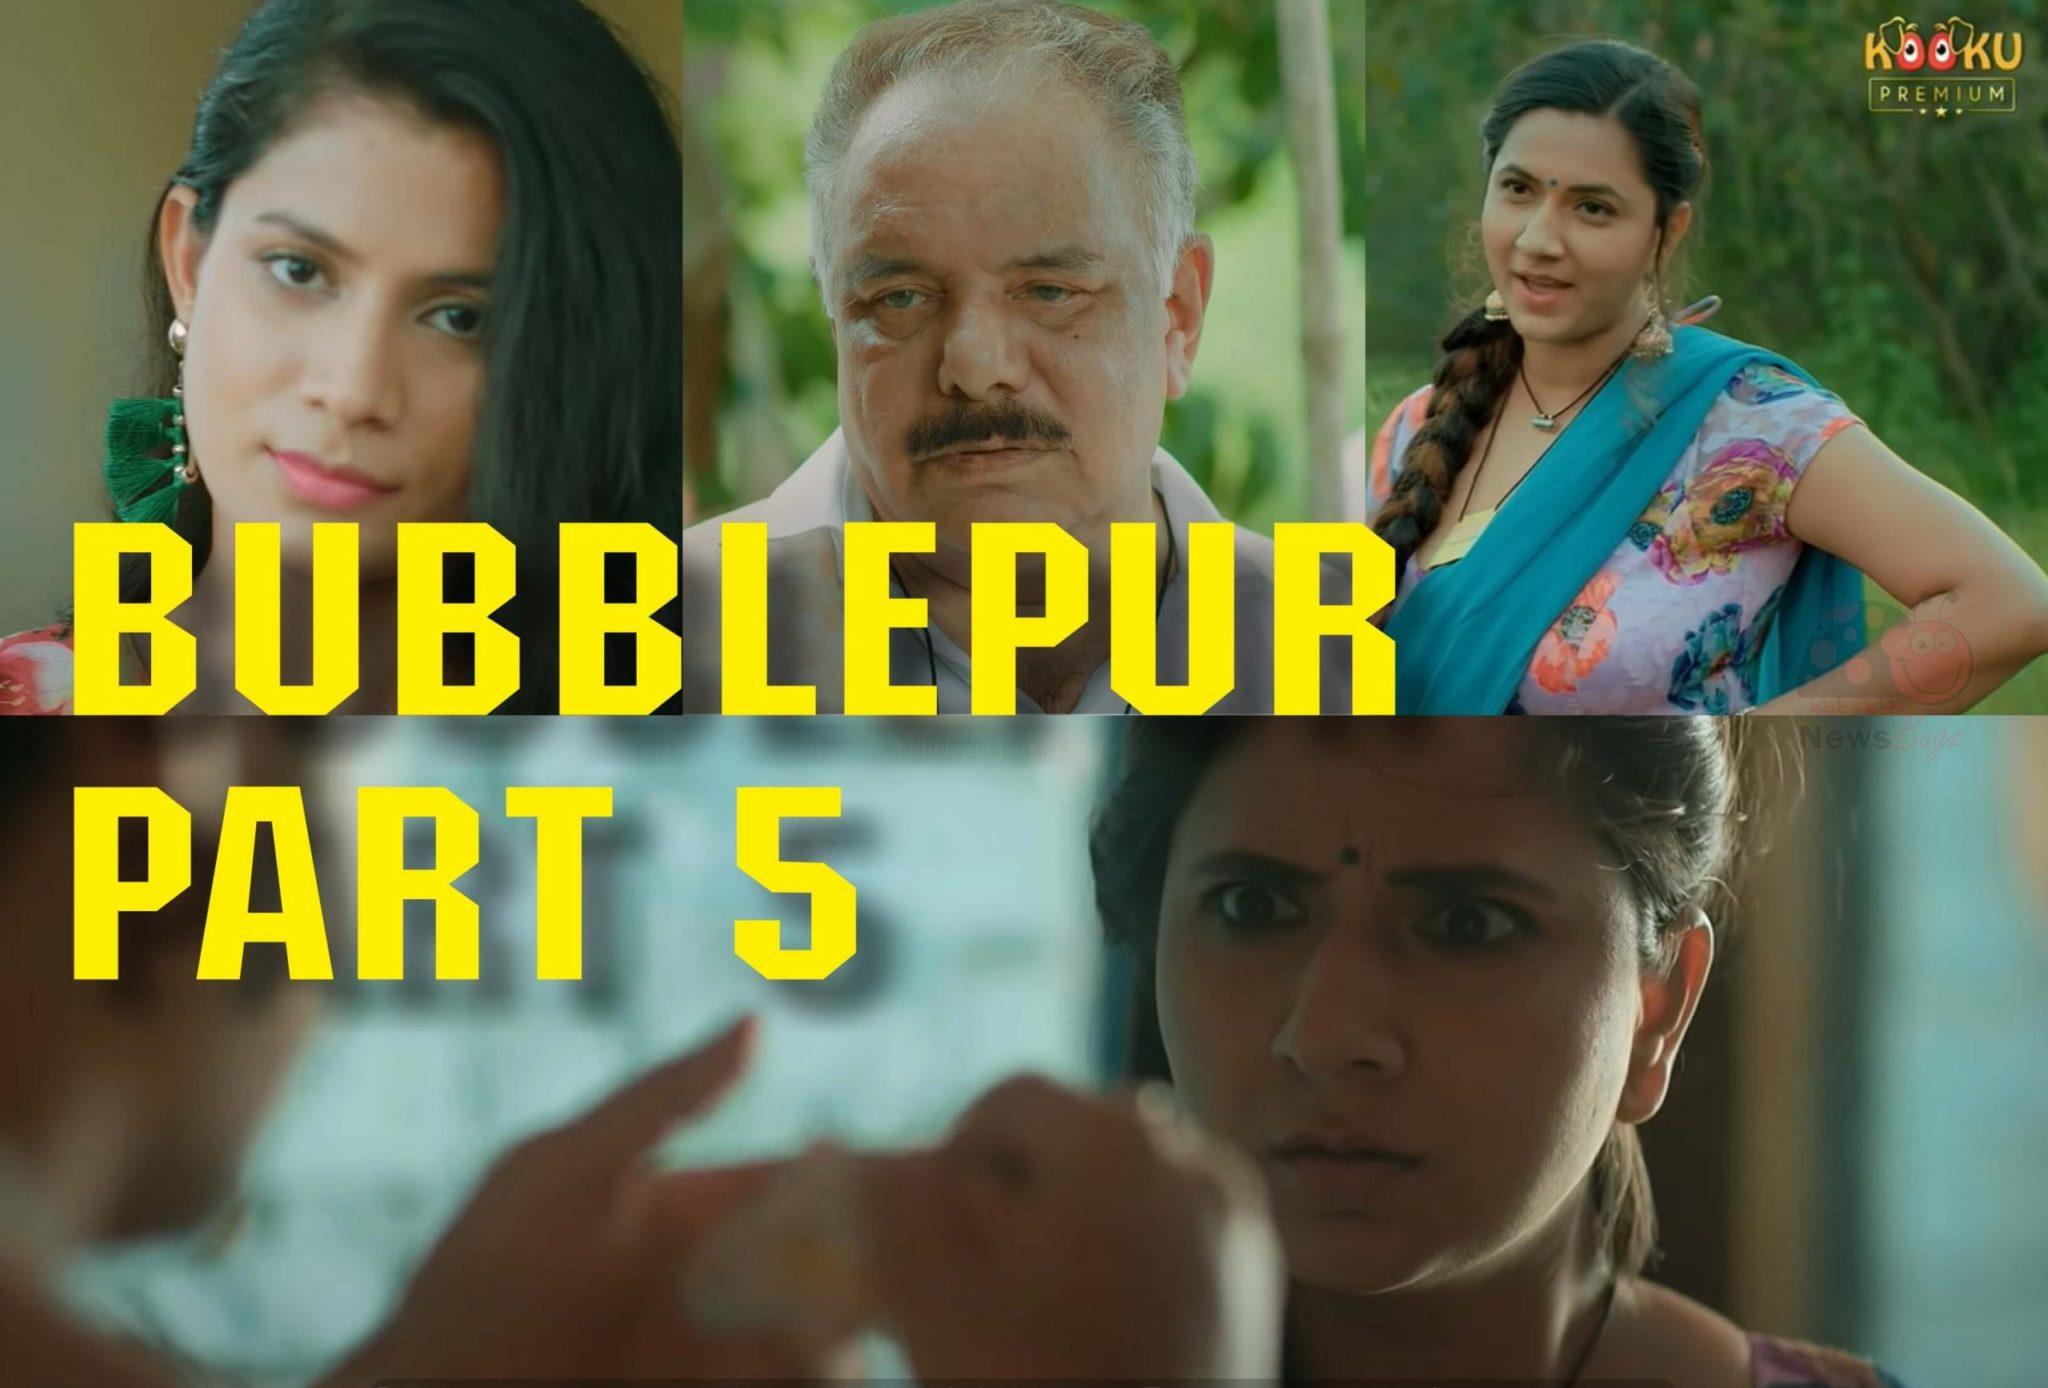 BubblePur Part 5 Webseries Kooku App All Episodes Watch Online Actress Name & Cast